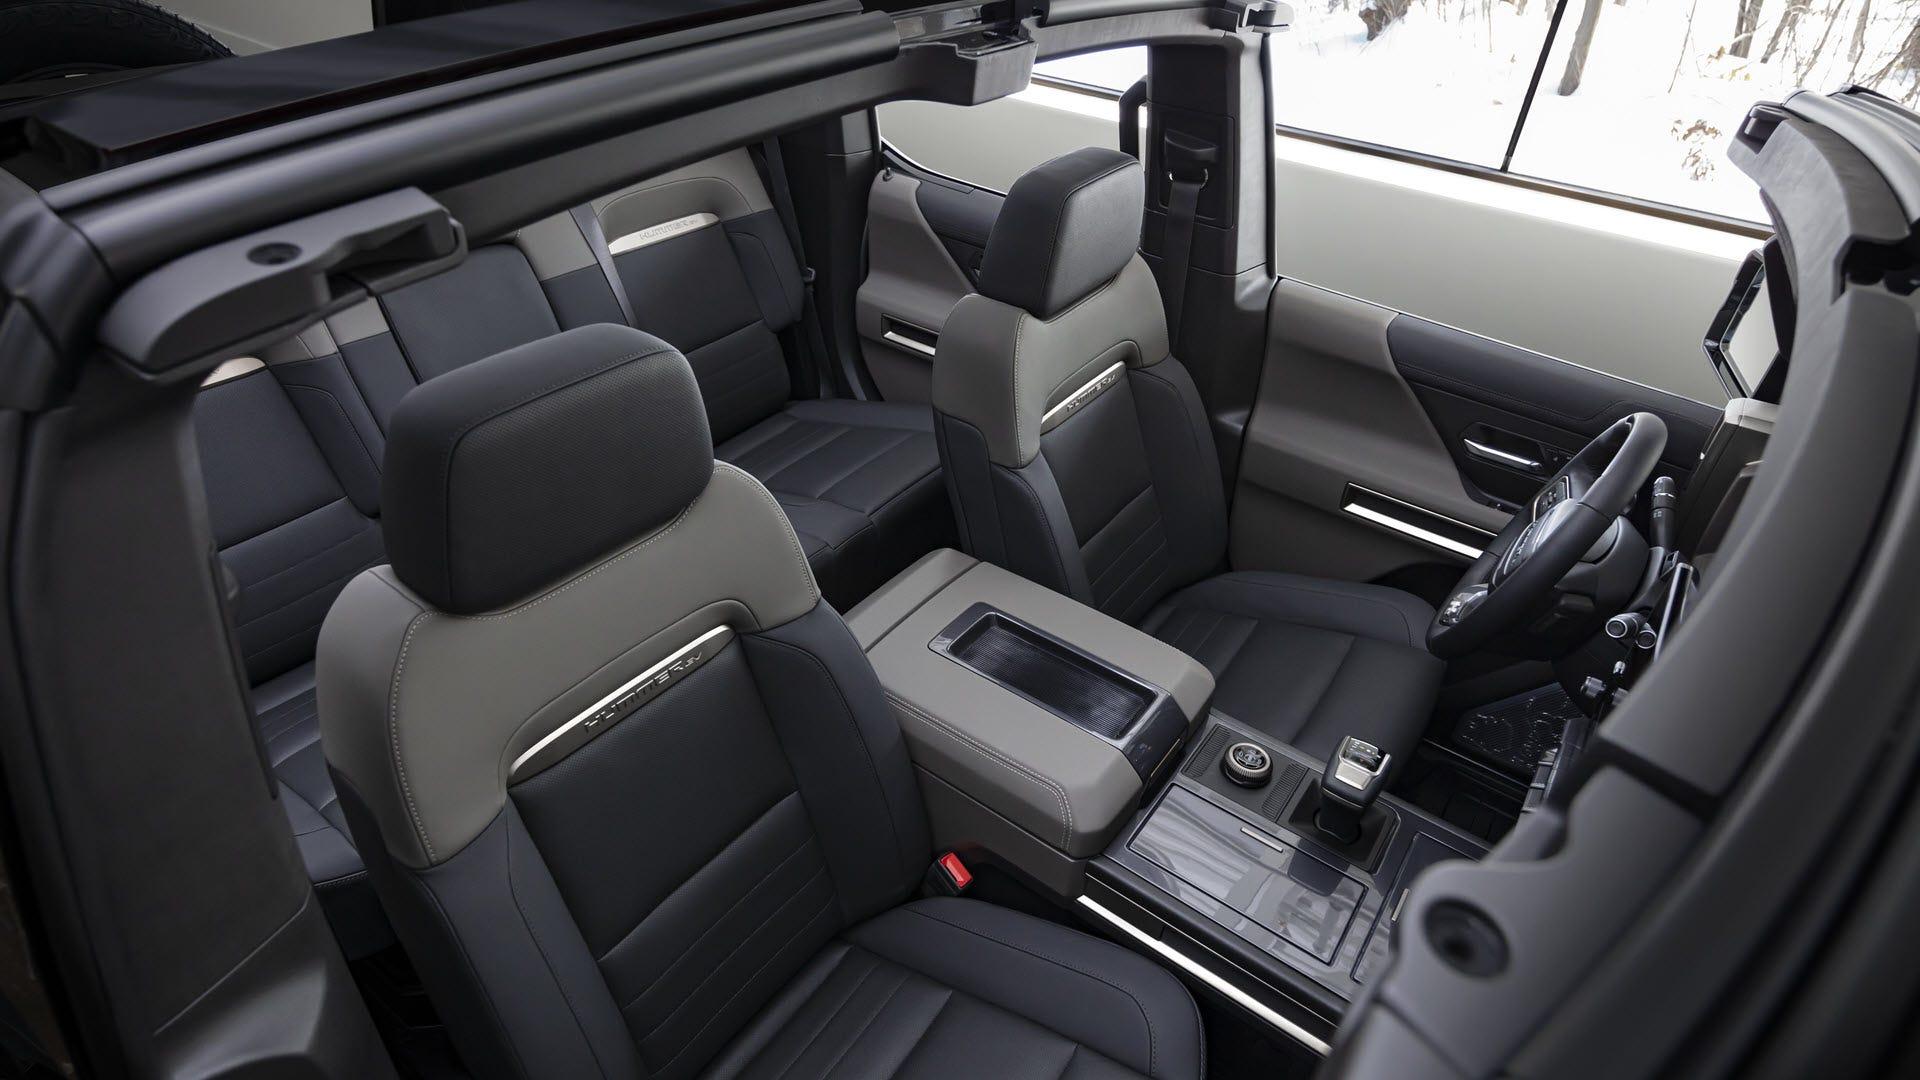 Hummer-SUV-EV-Smartphonegreece (3)